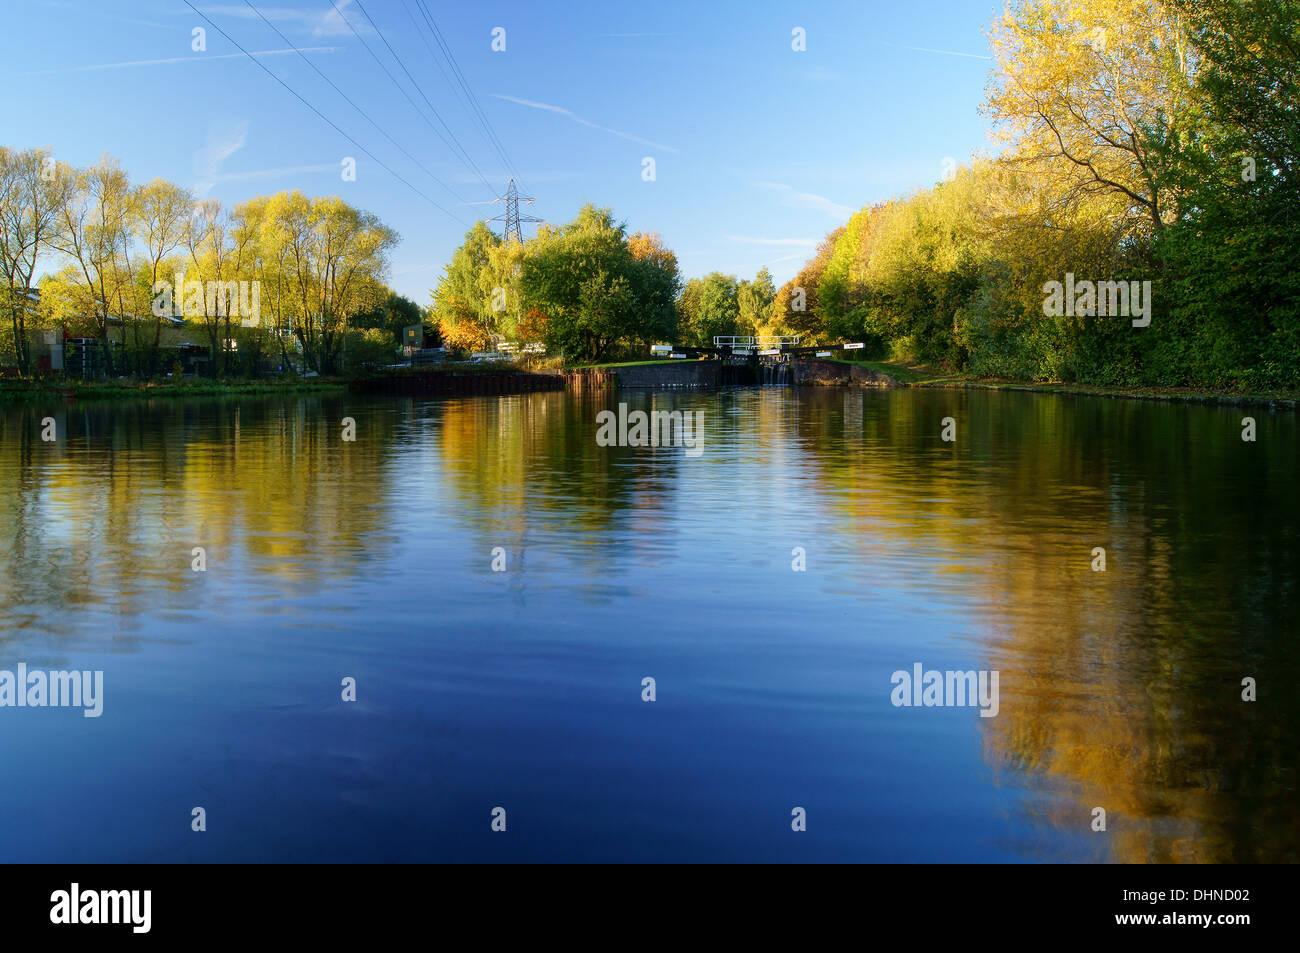 UK,South Yorkshire,Sheffield,Sheffield Canal near Tinsley Marina - Stock Image